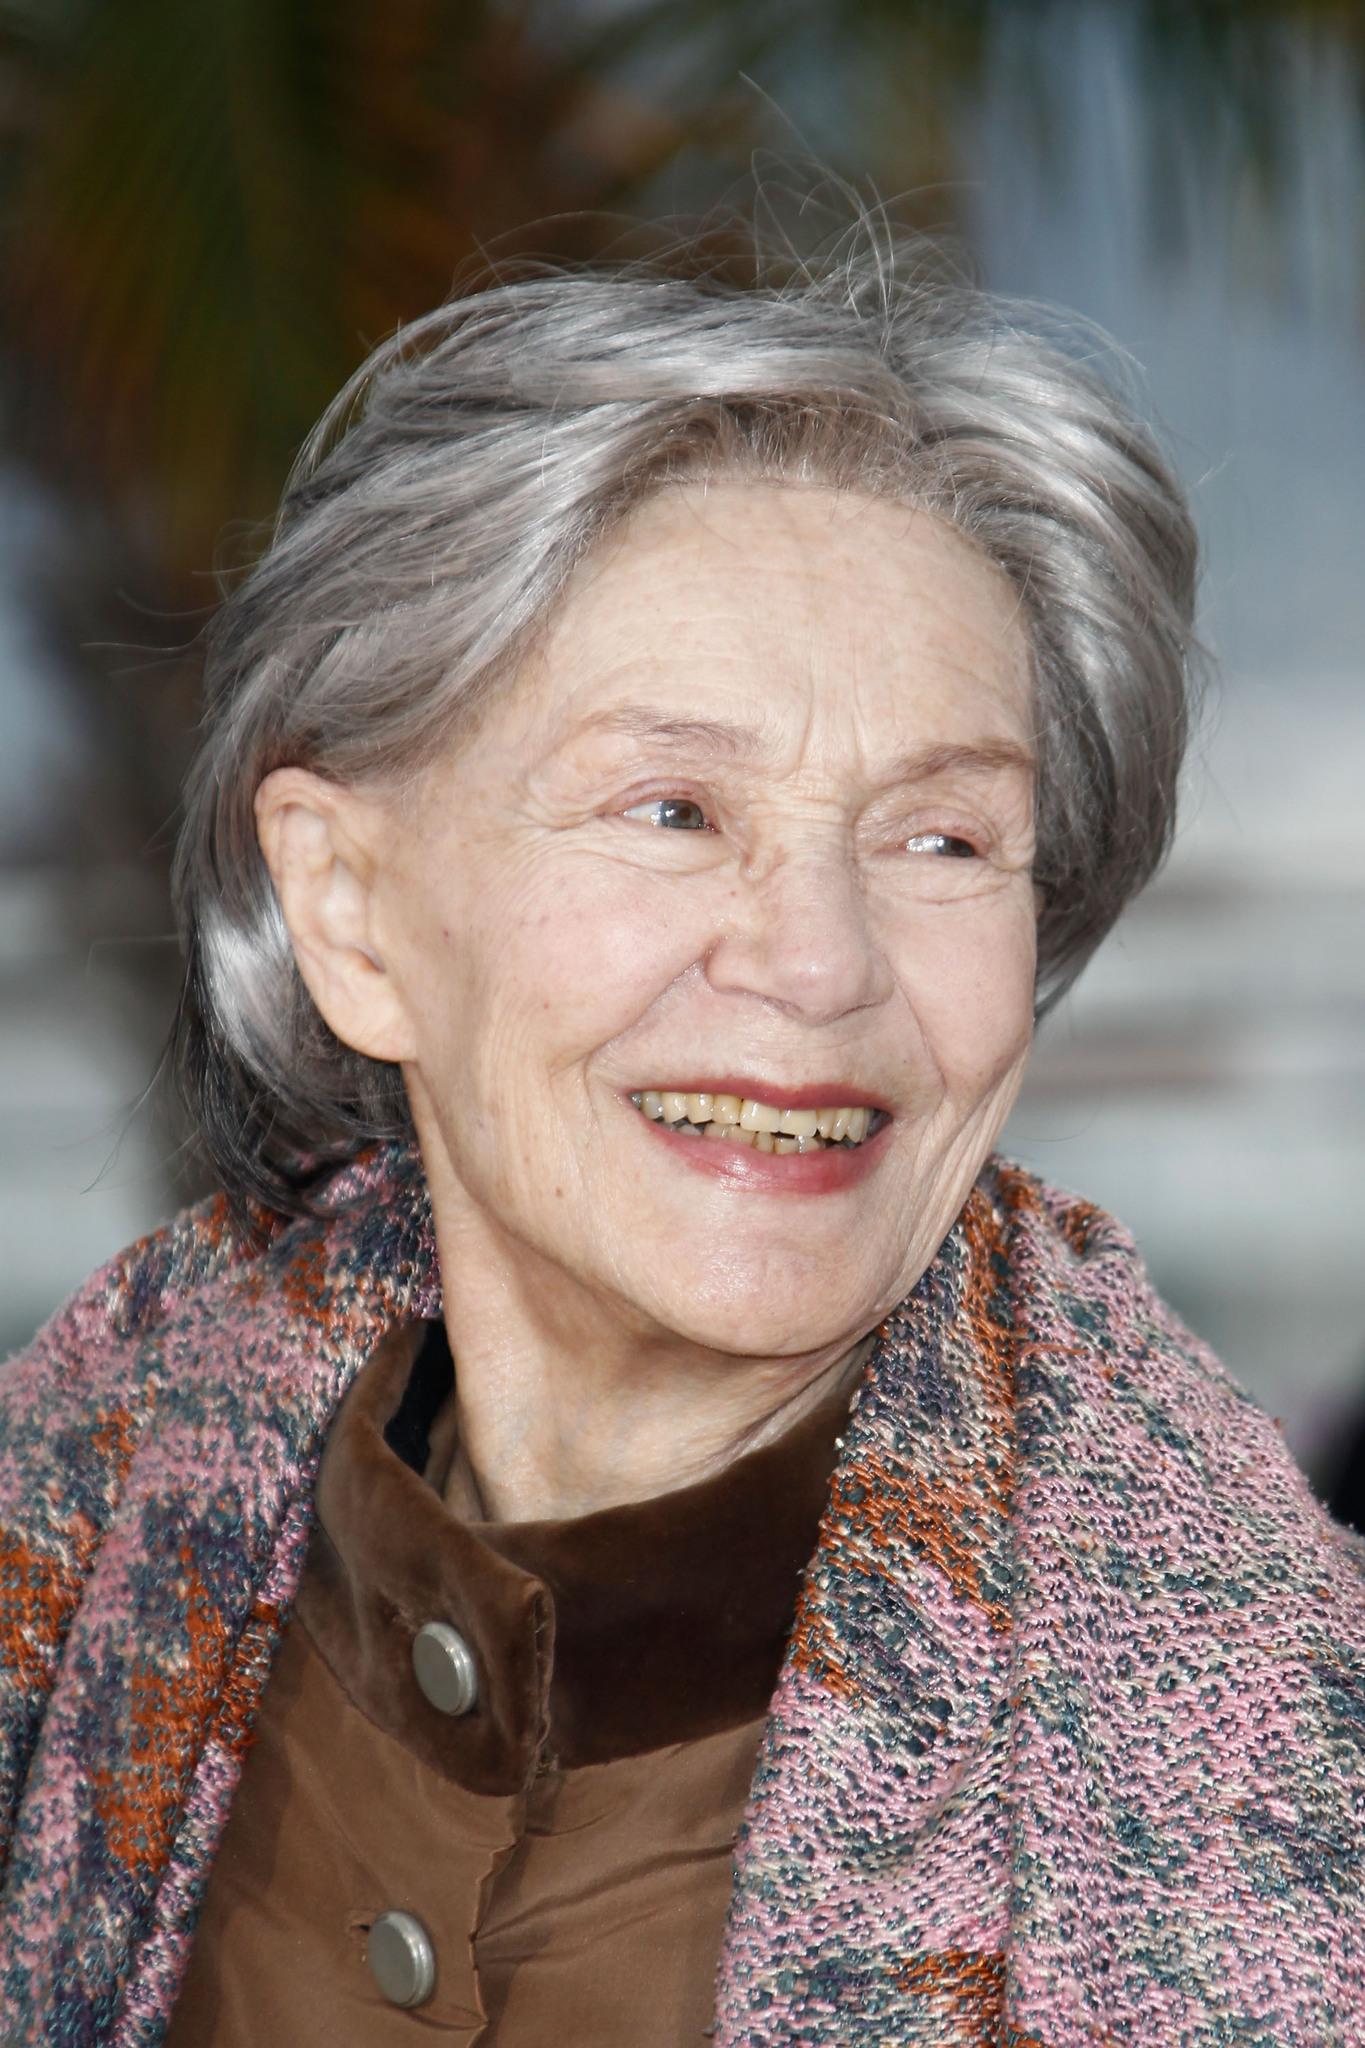 Emmanuelle Riva belmondo